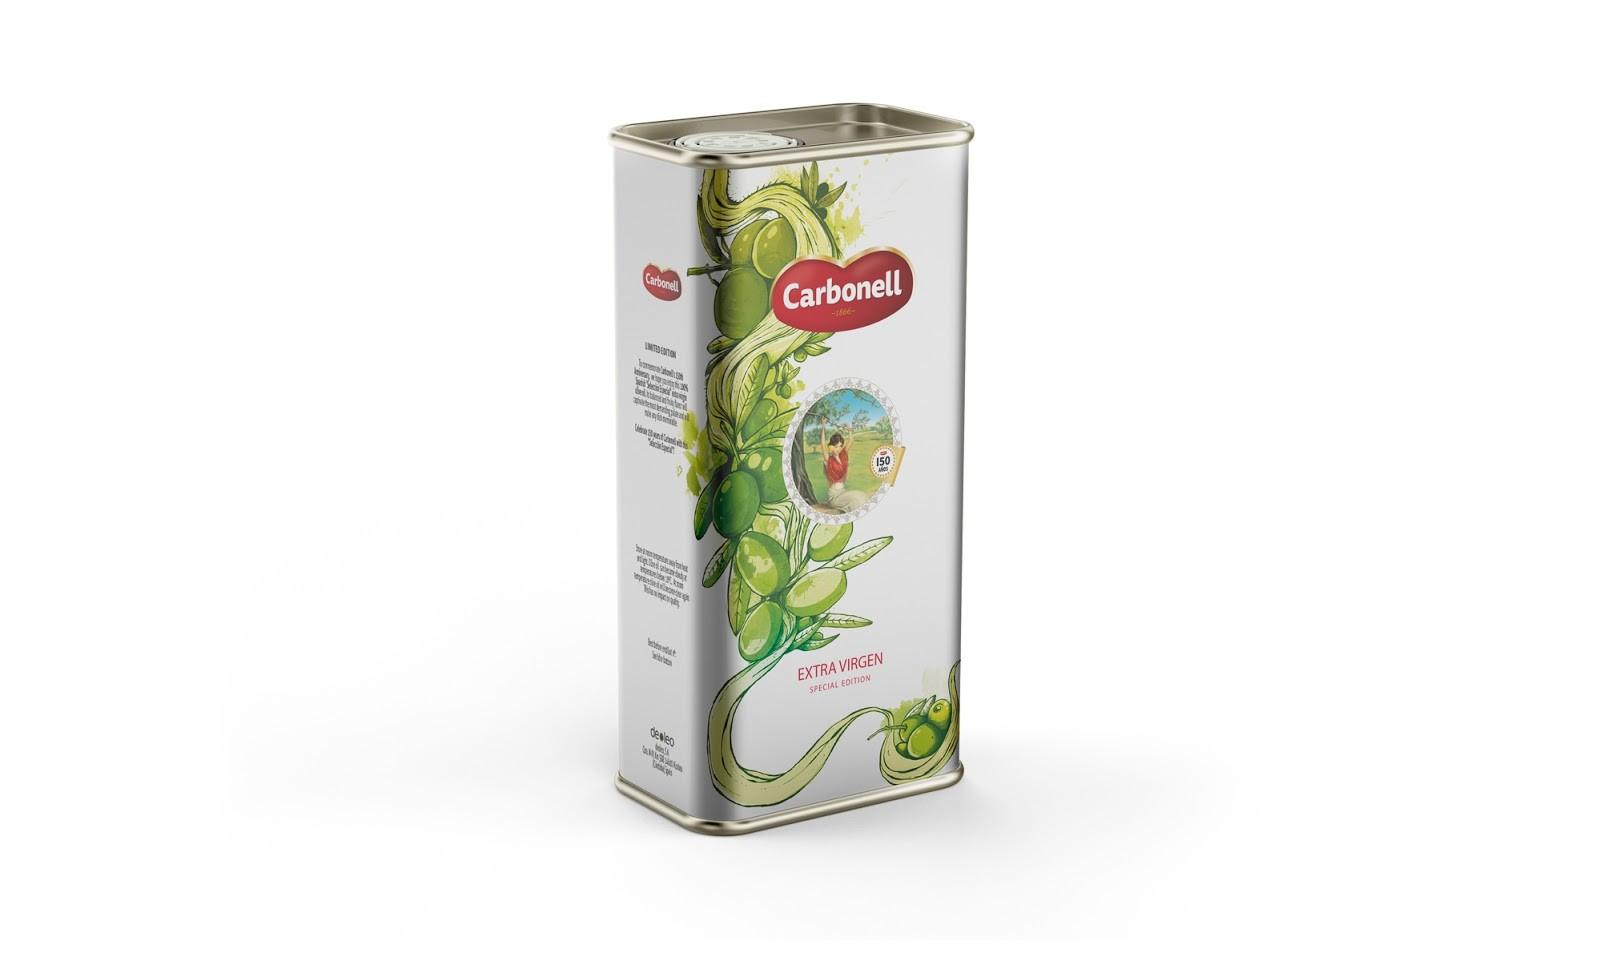 Carbonell橄榄油包装设计